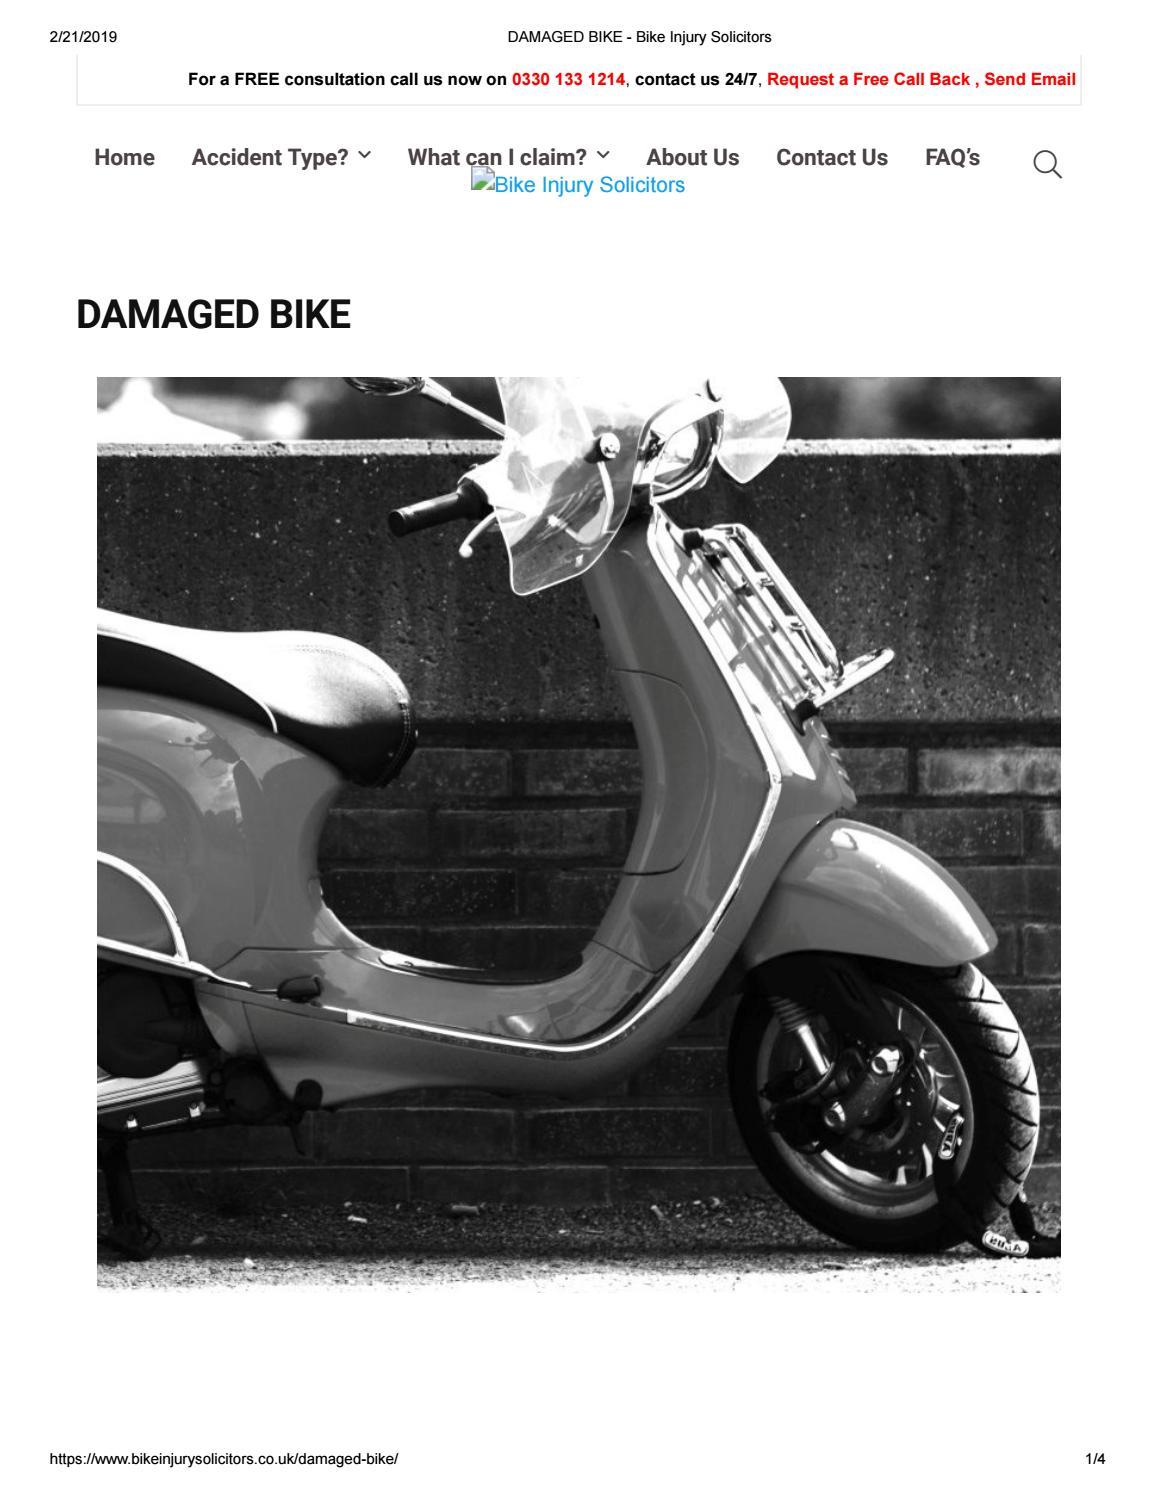 Bike/Motorcycle Injury Claim Manchester, Motorbike Accident